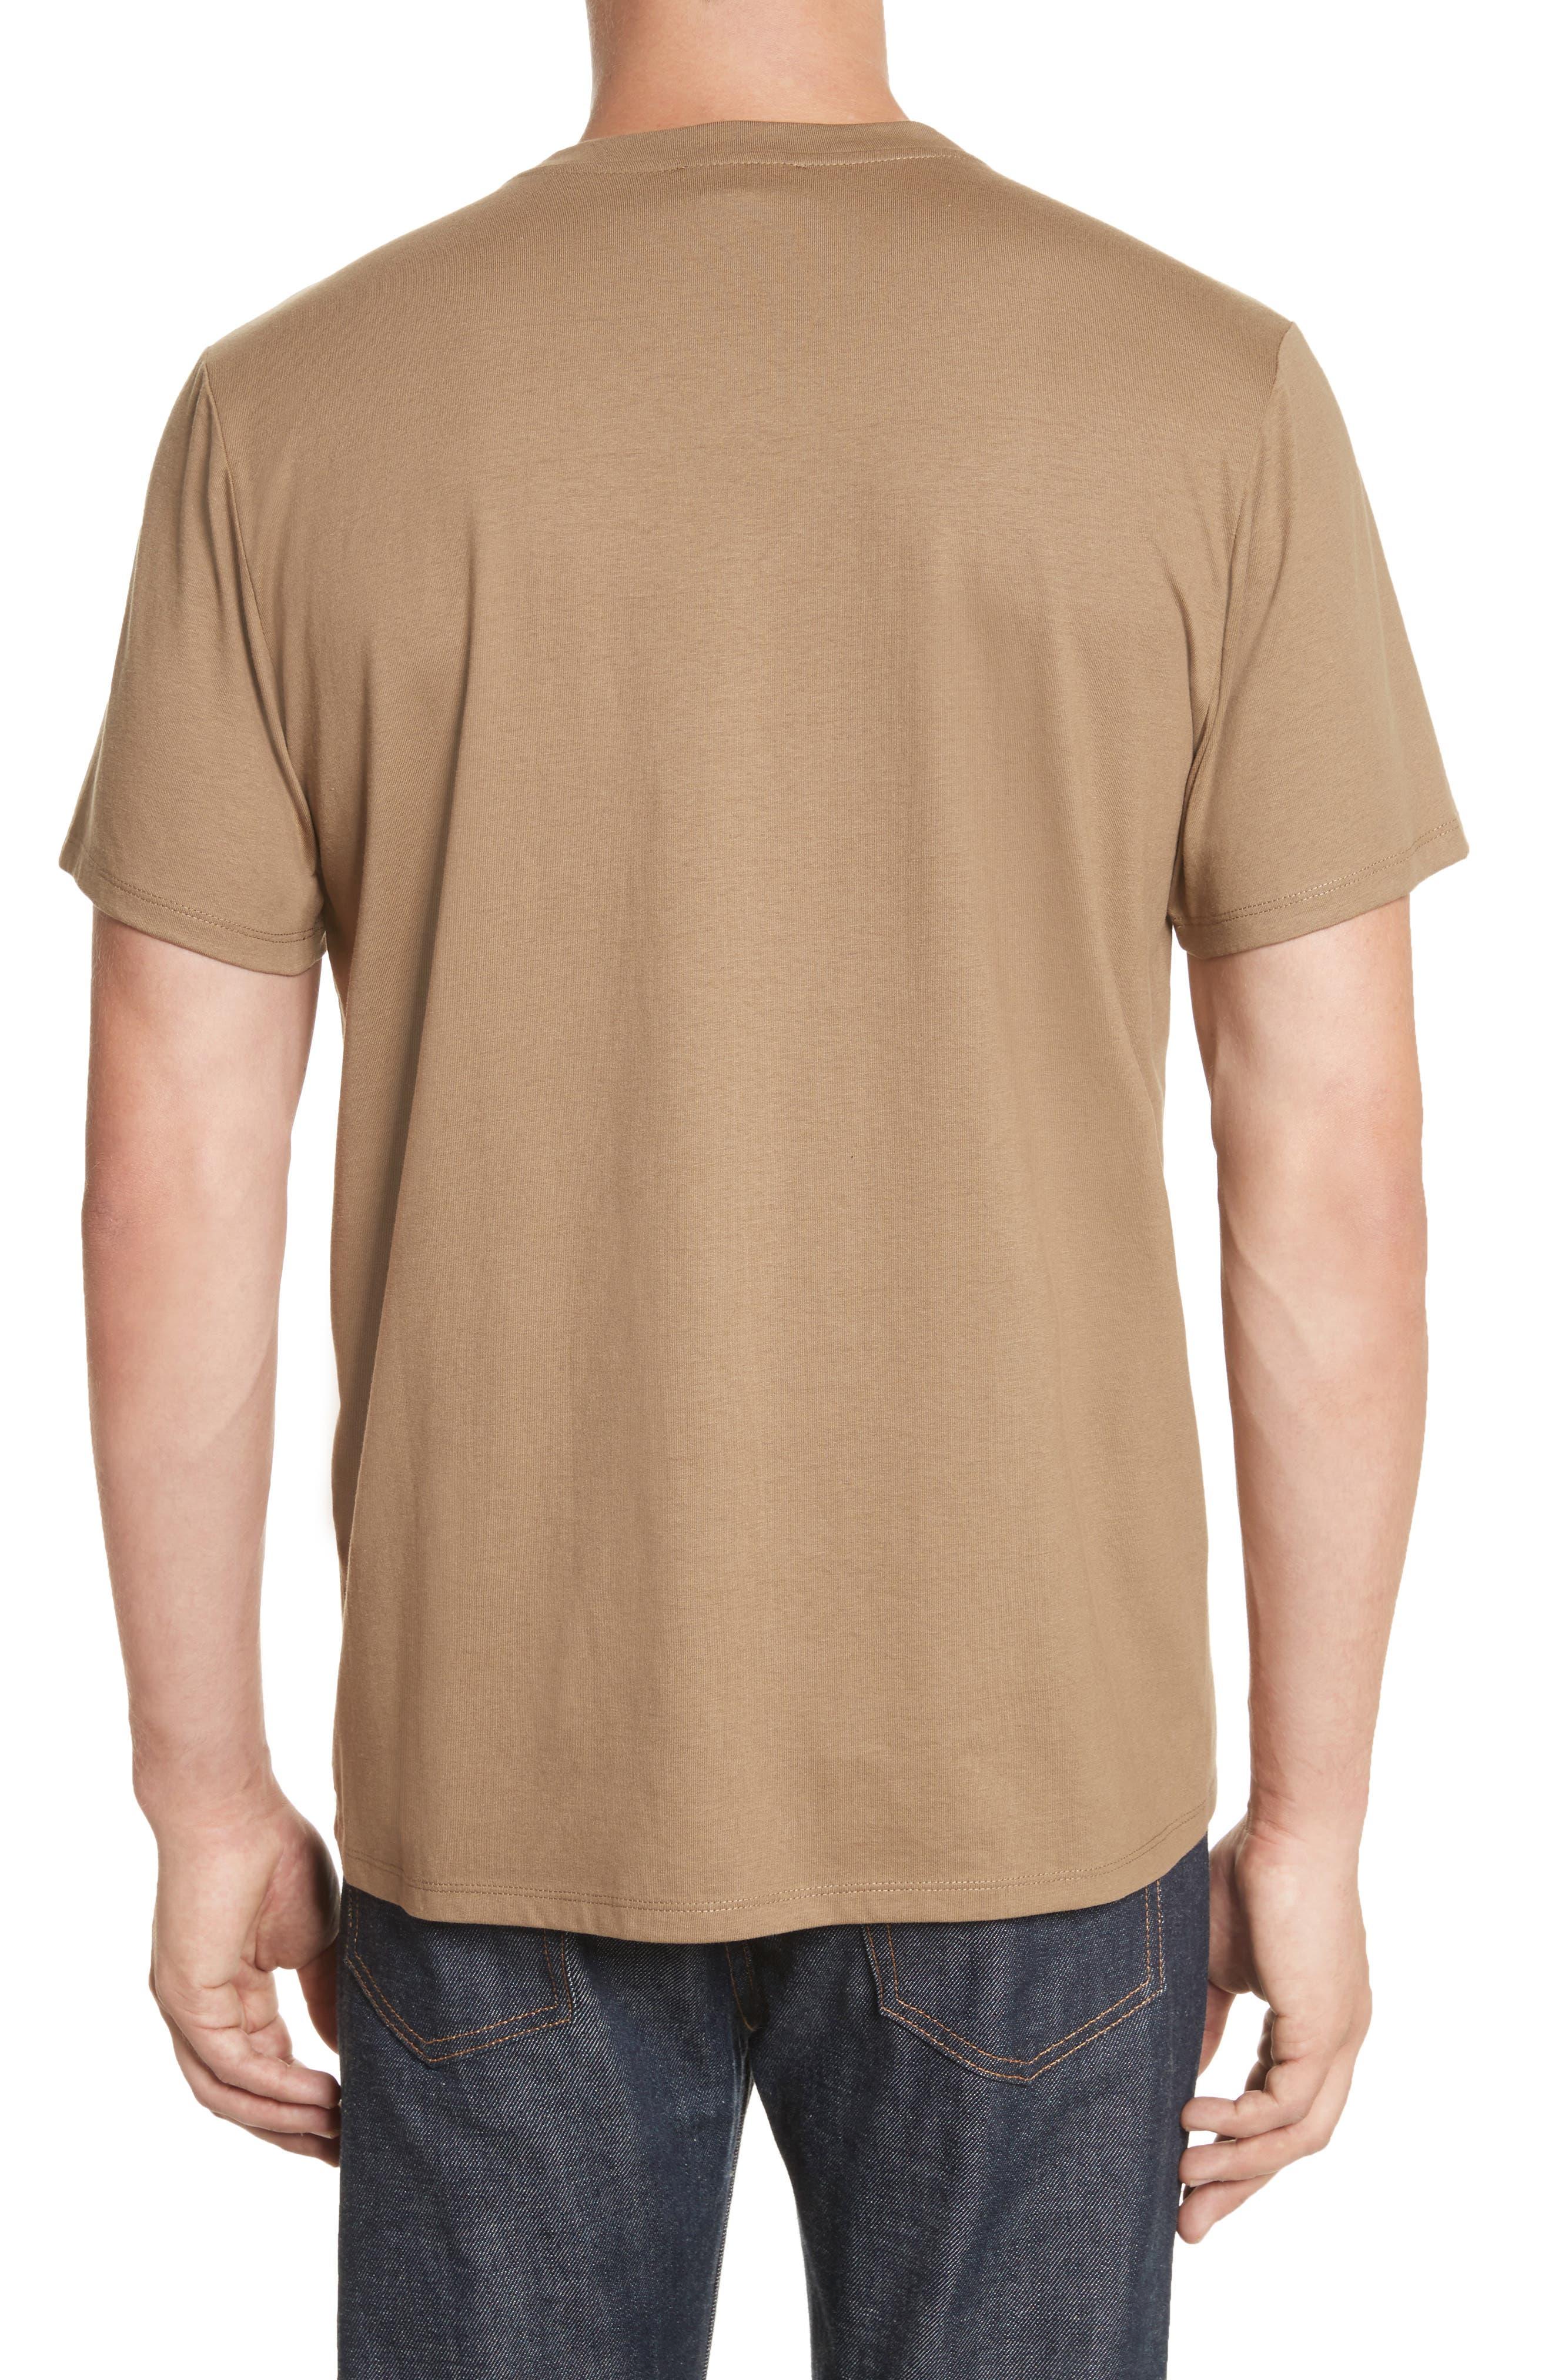 Jimmy T-Shirt,                             Alternate thumbnail 2, color,                             Taupe